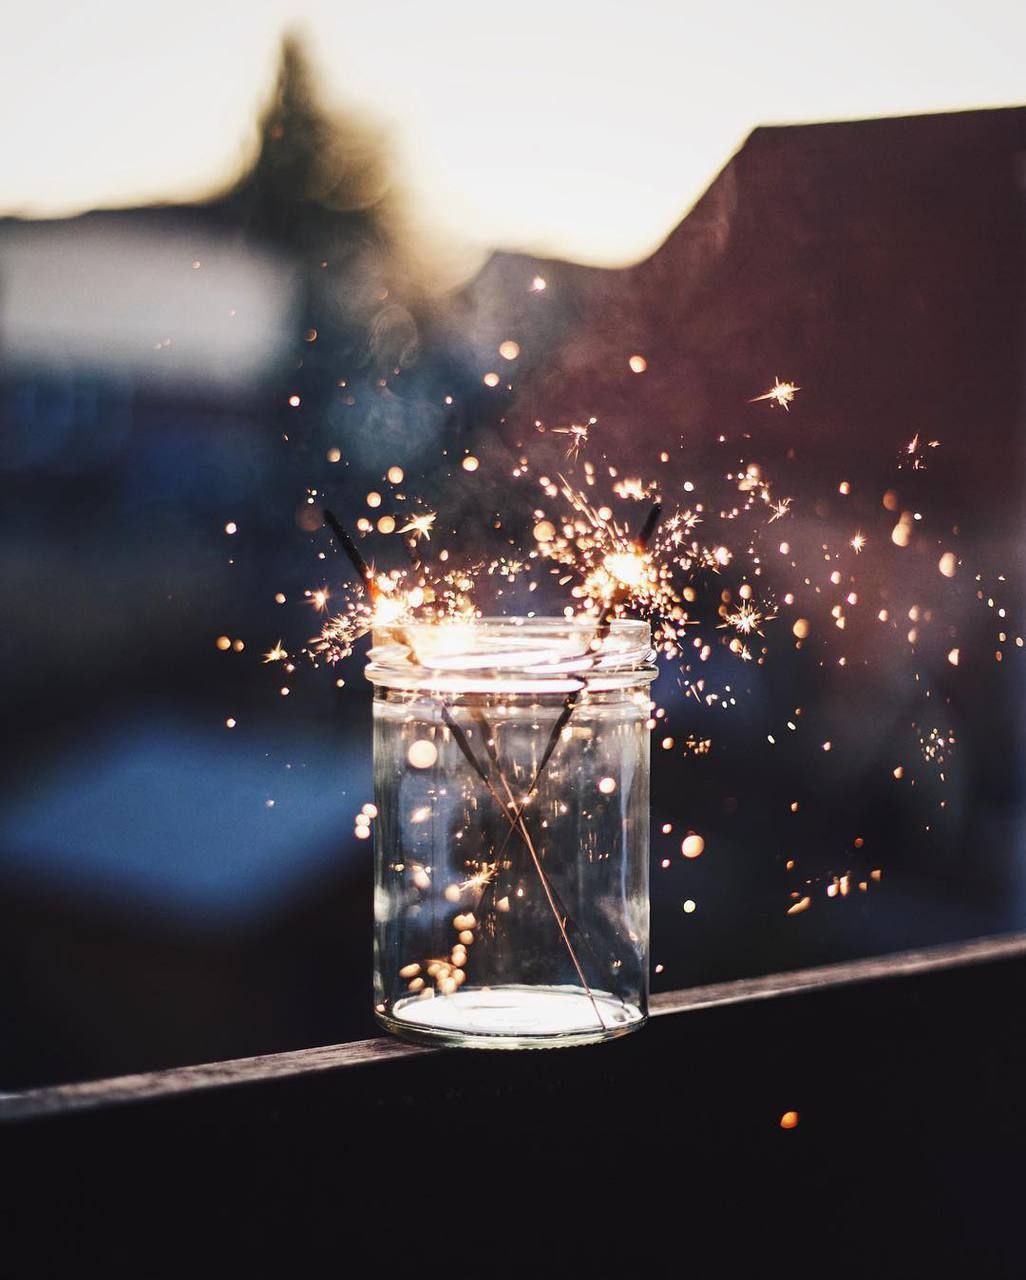 Sparkle Tumblr Photography Art Photography Sparklers